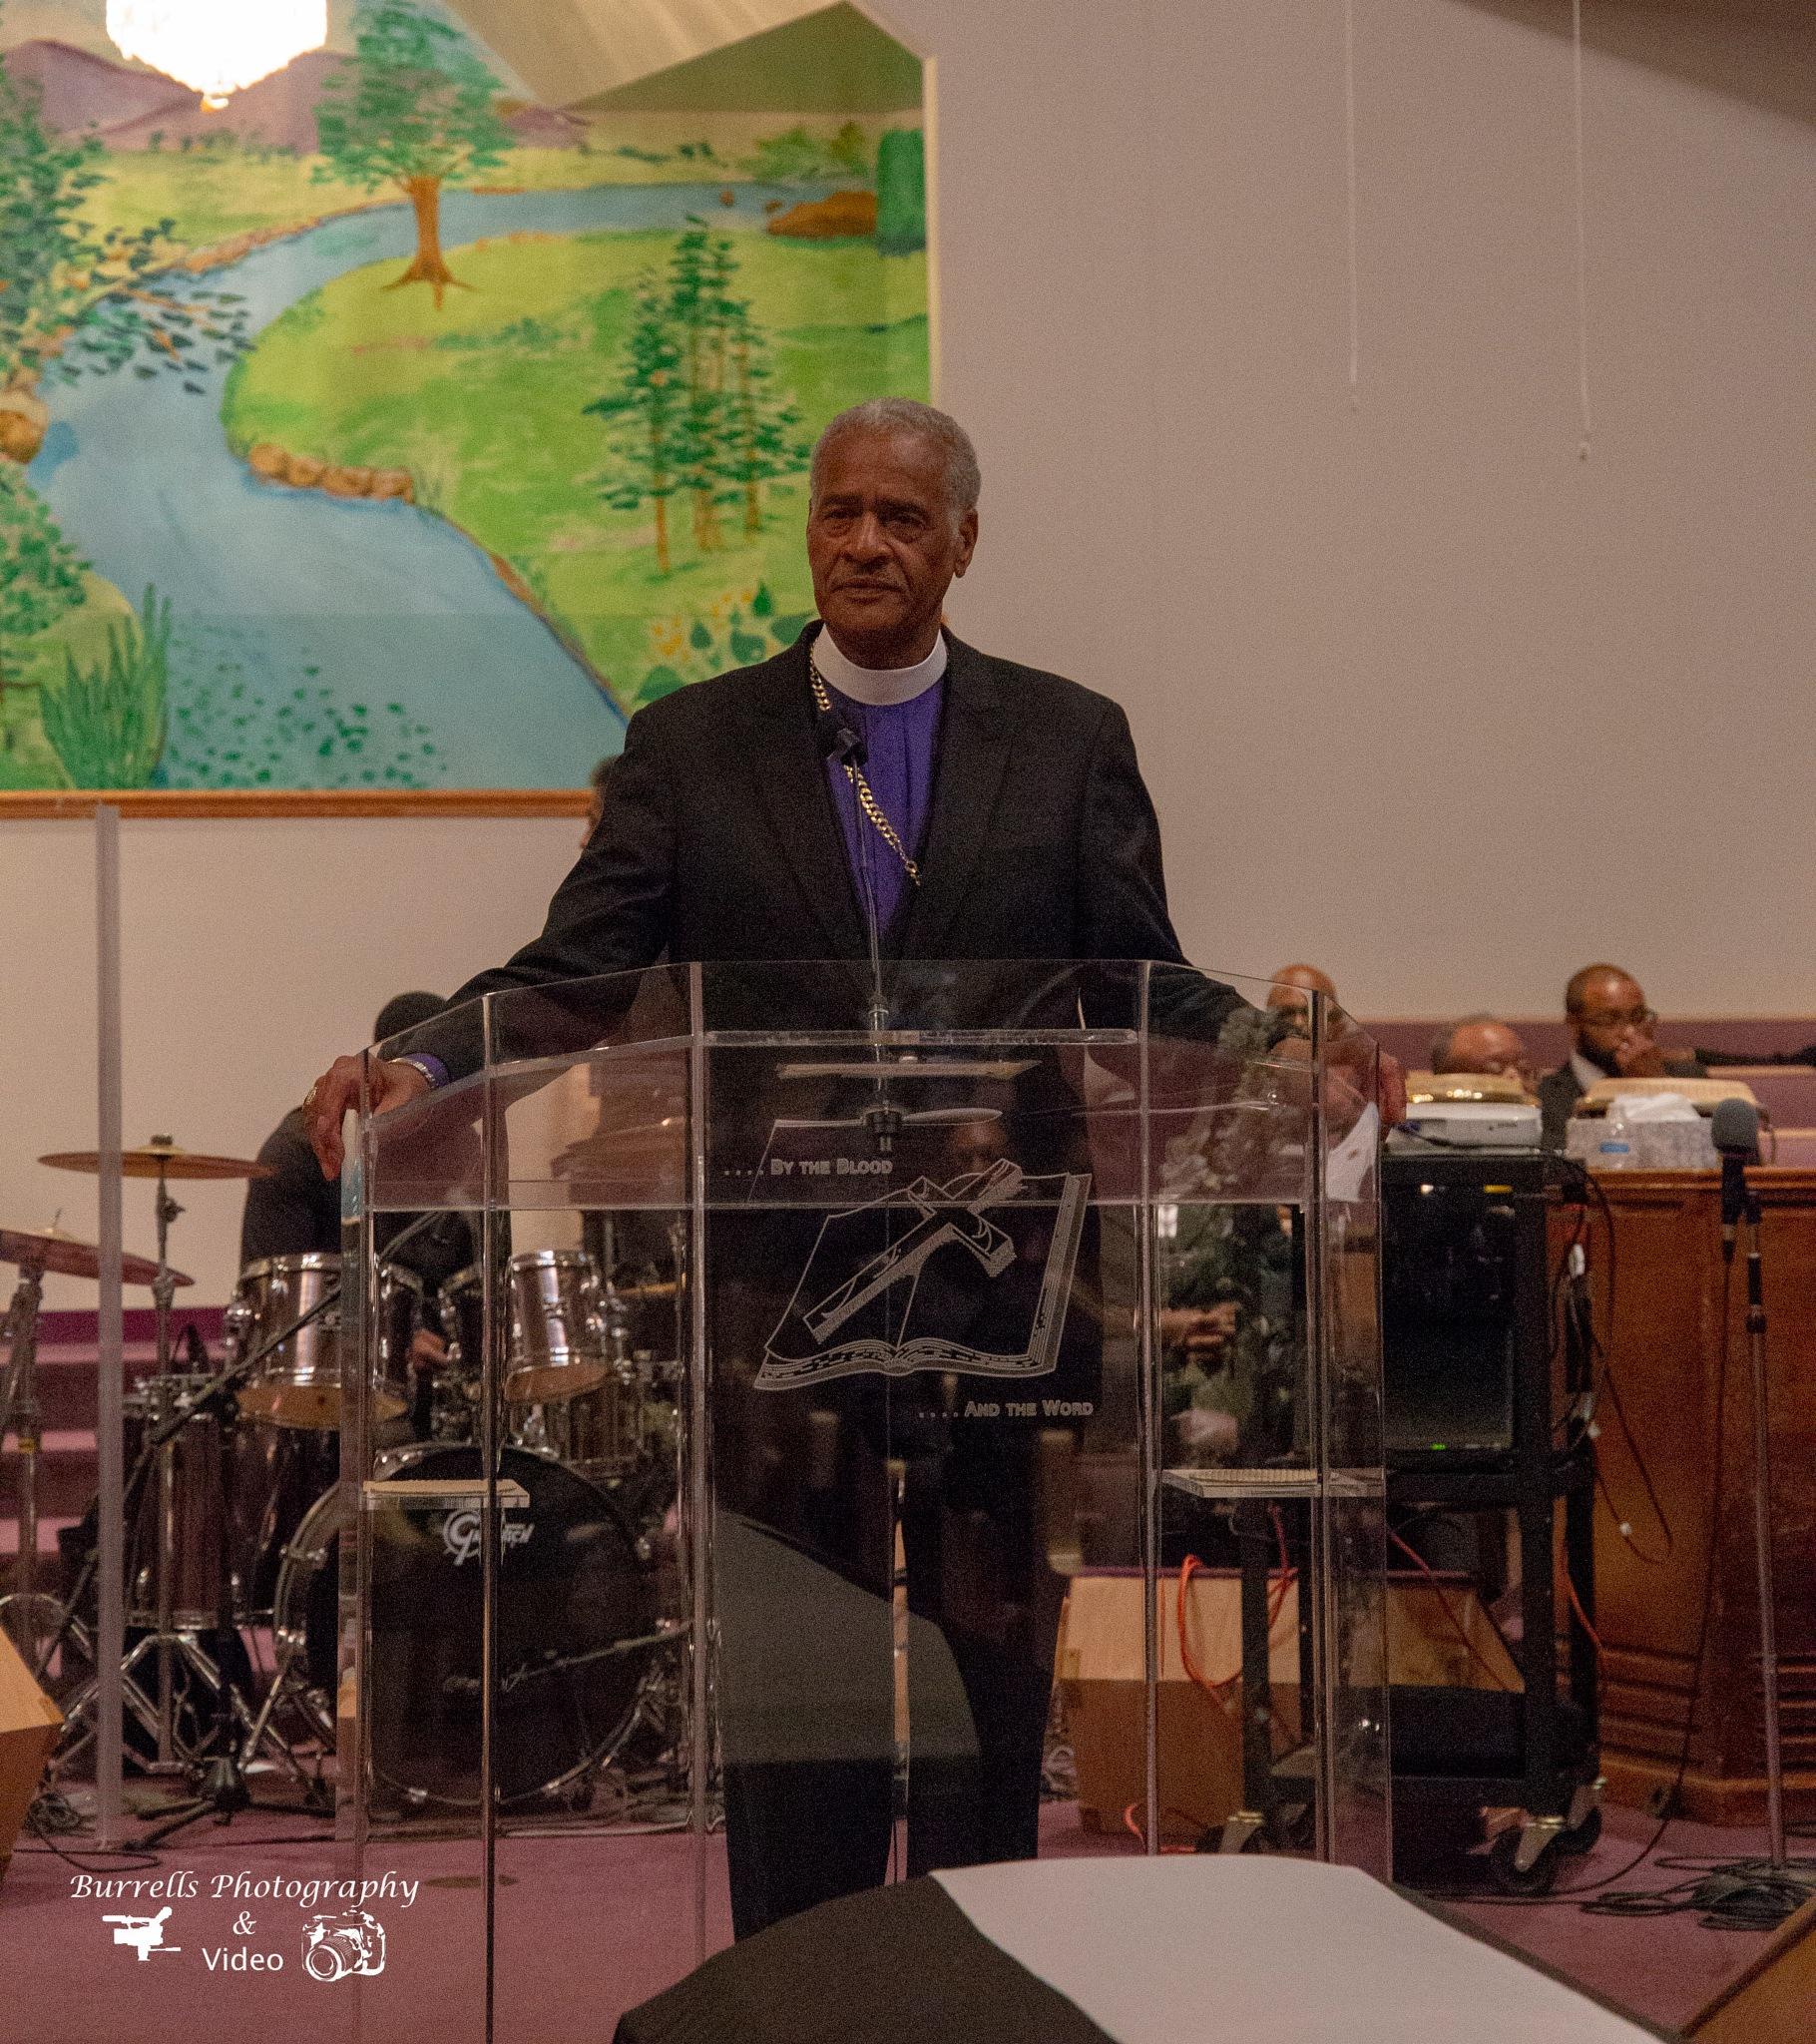 Bishop Speaks by Robert Burrell